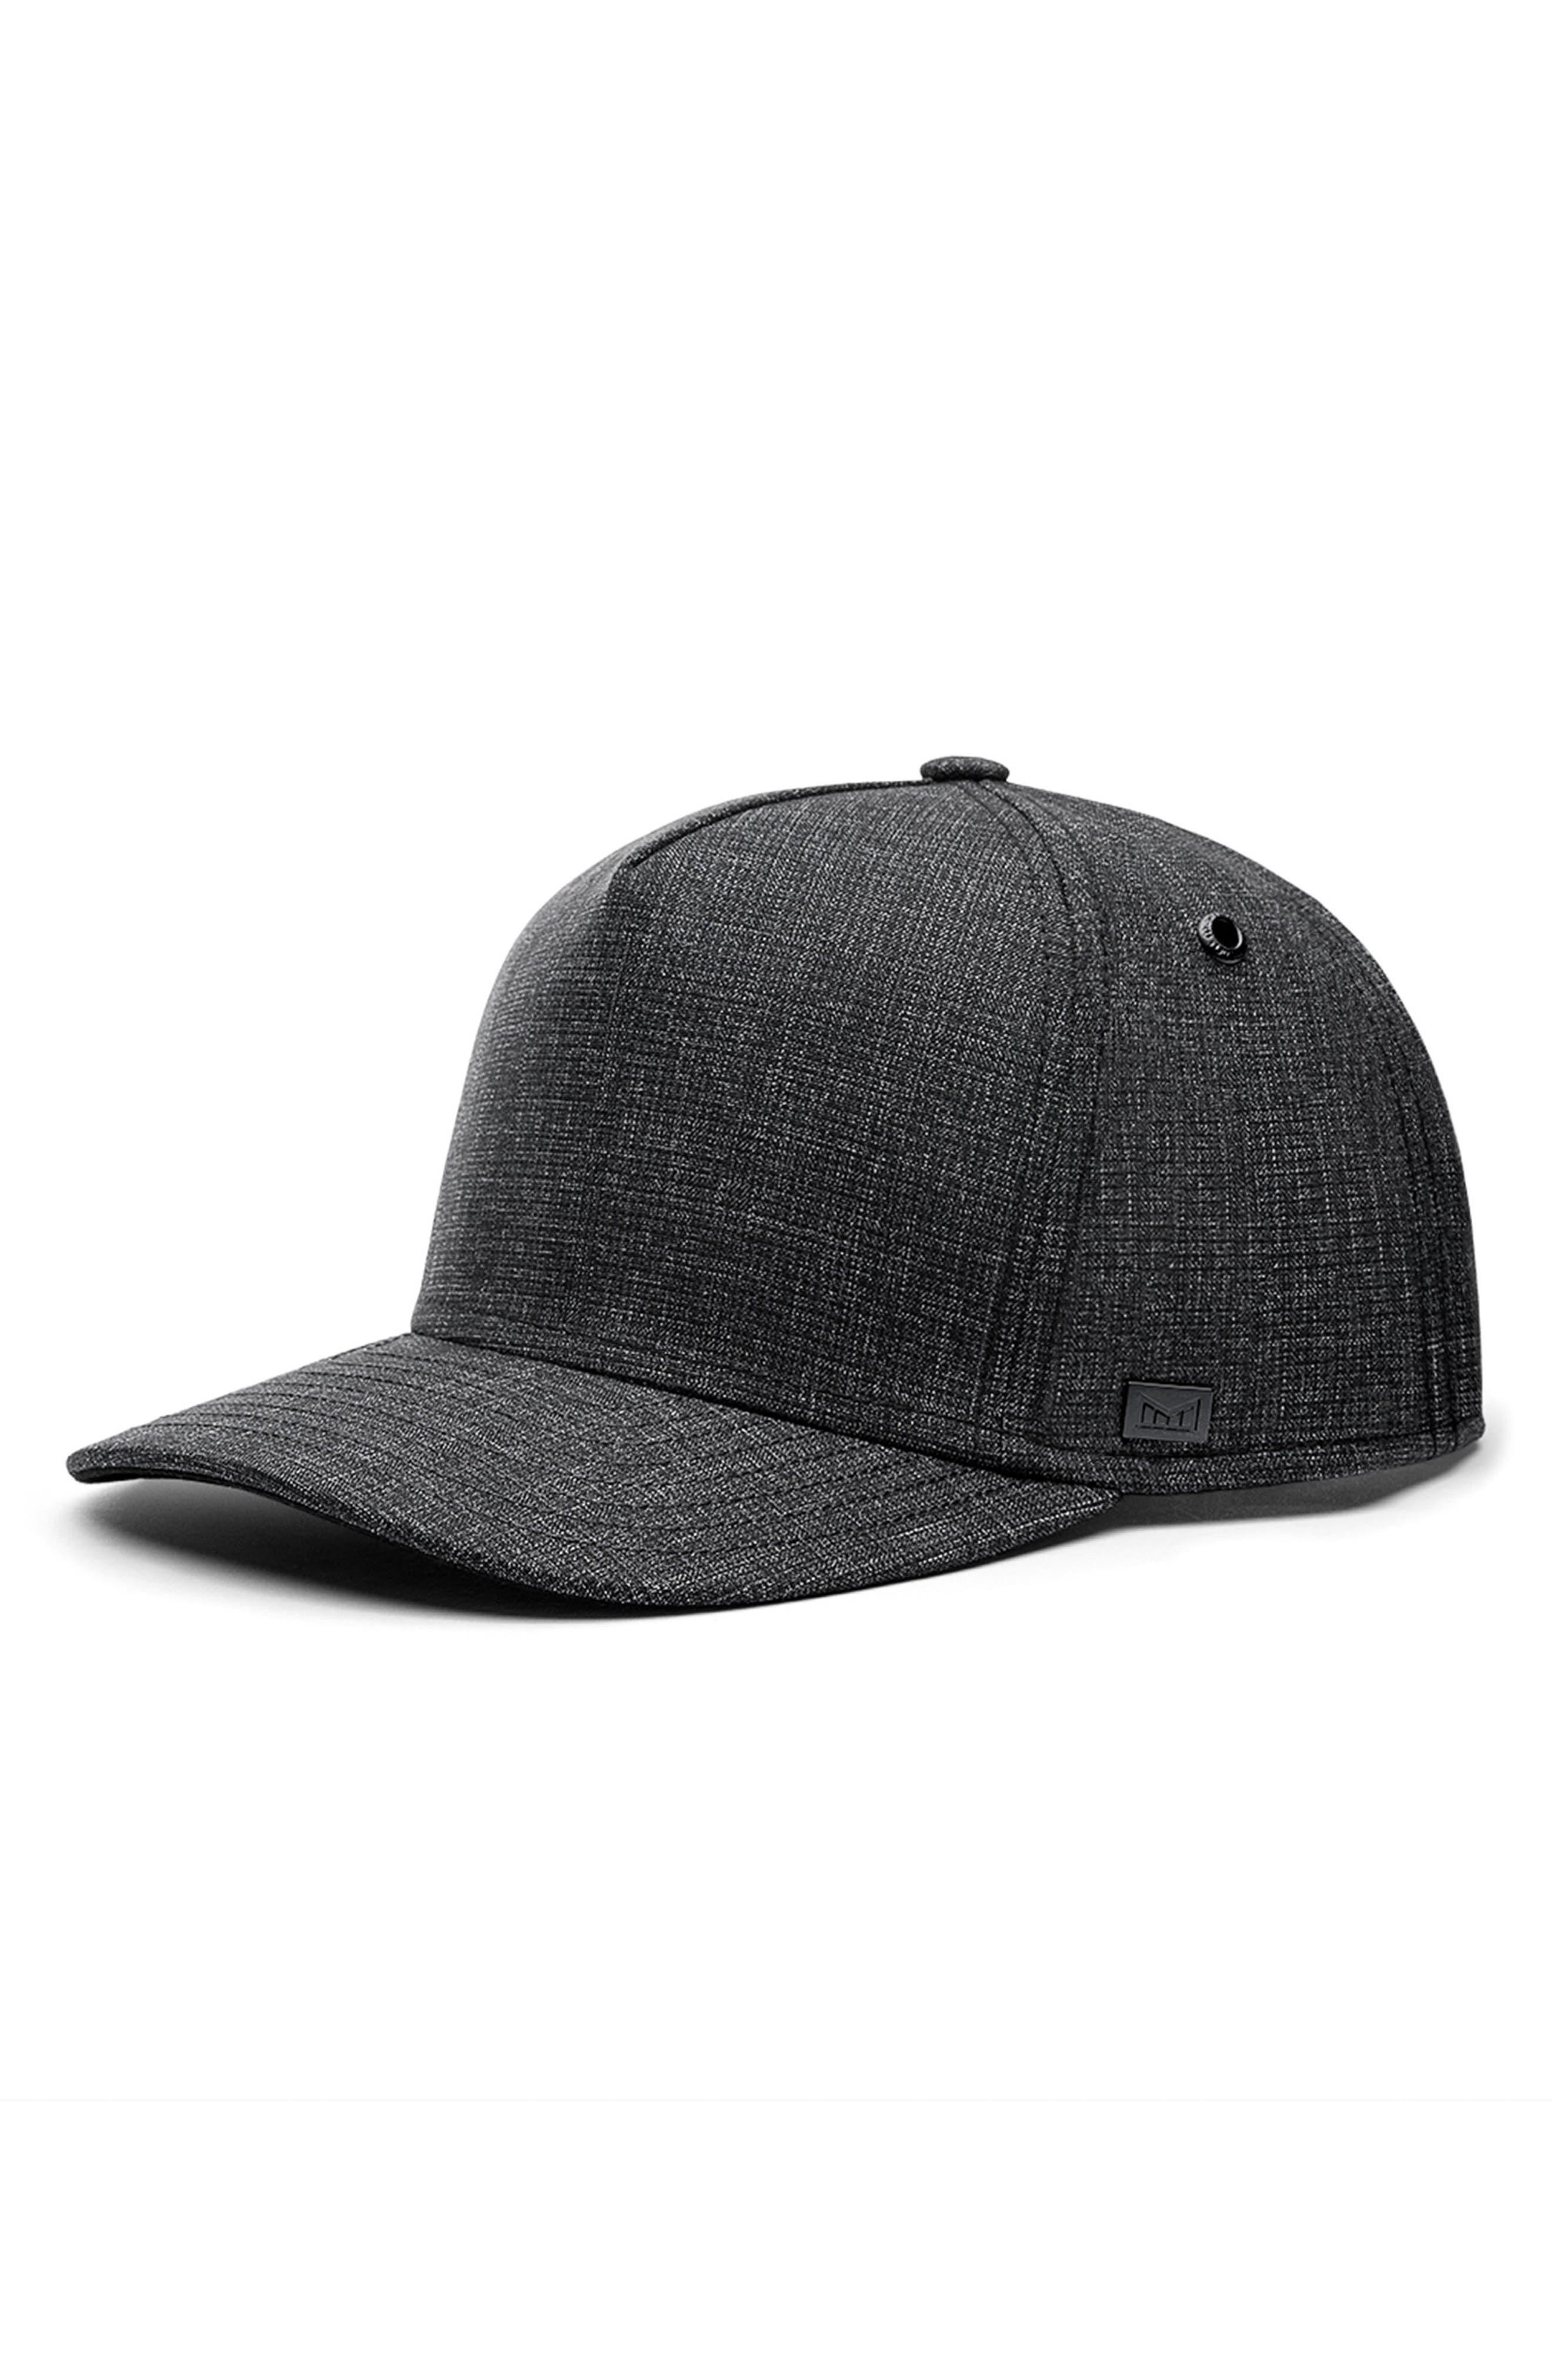 Odyssey Baseball Cap,                         Main,                         color, CHARCOAL